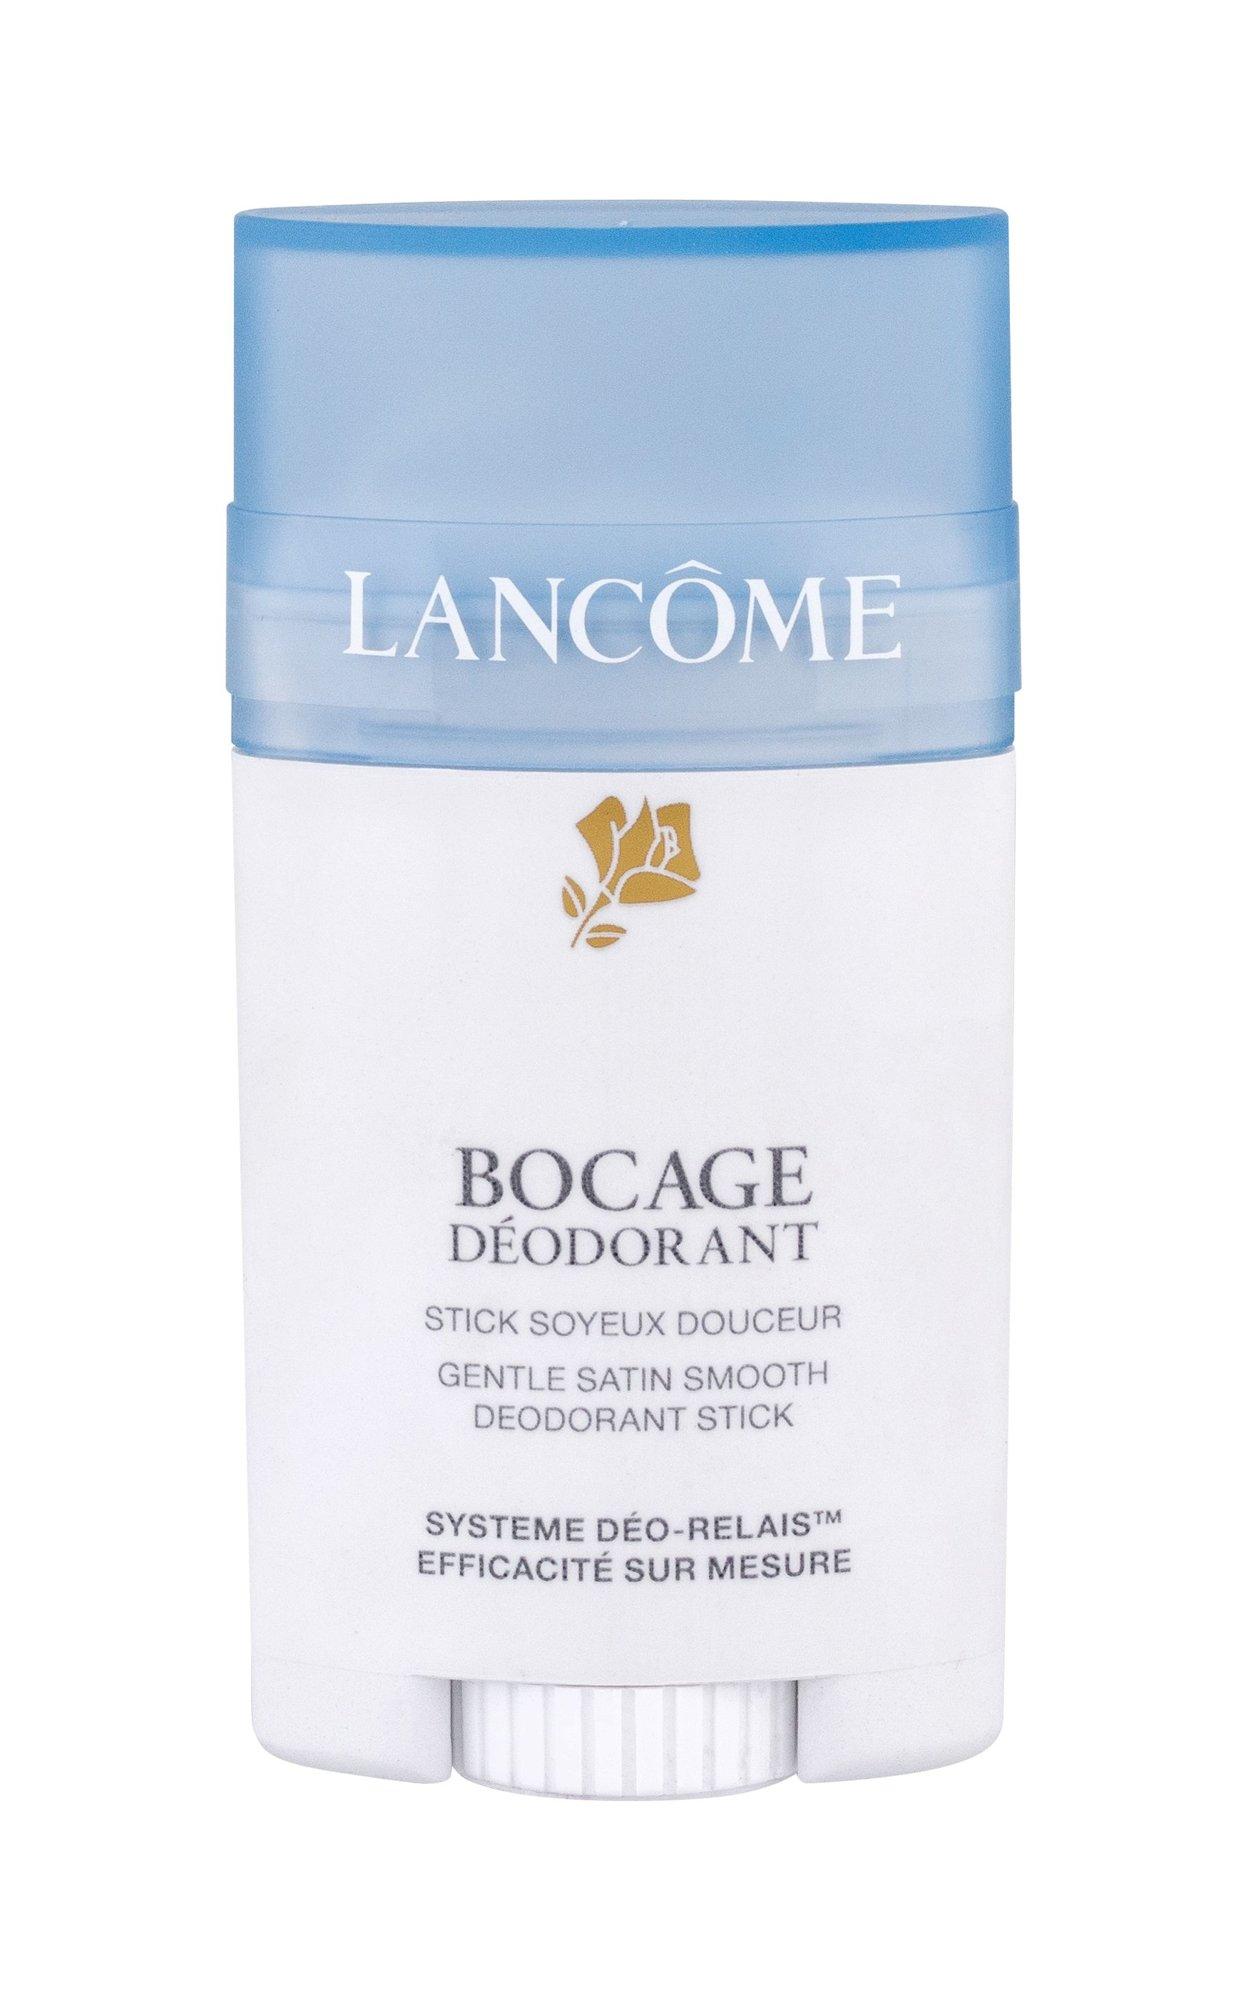 Lancôme Bocage Deodorant 40ml